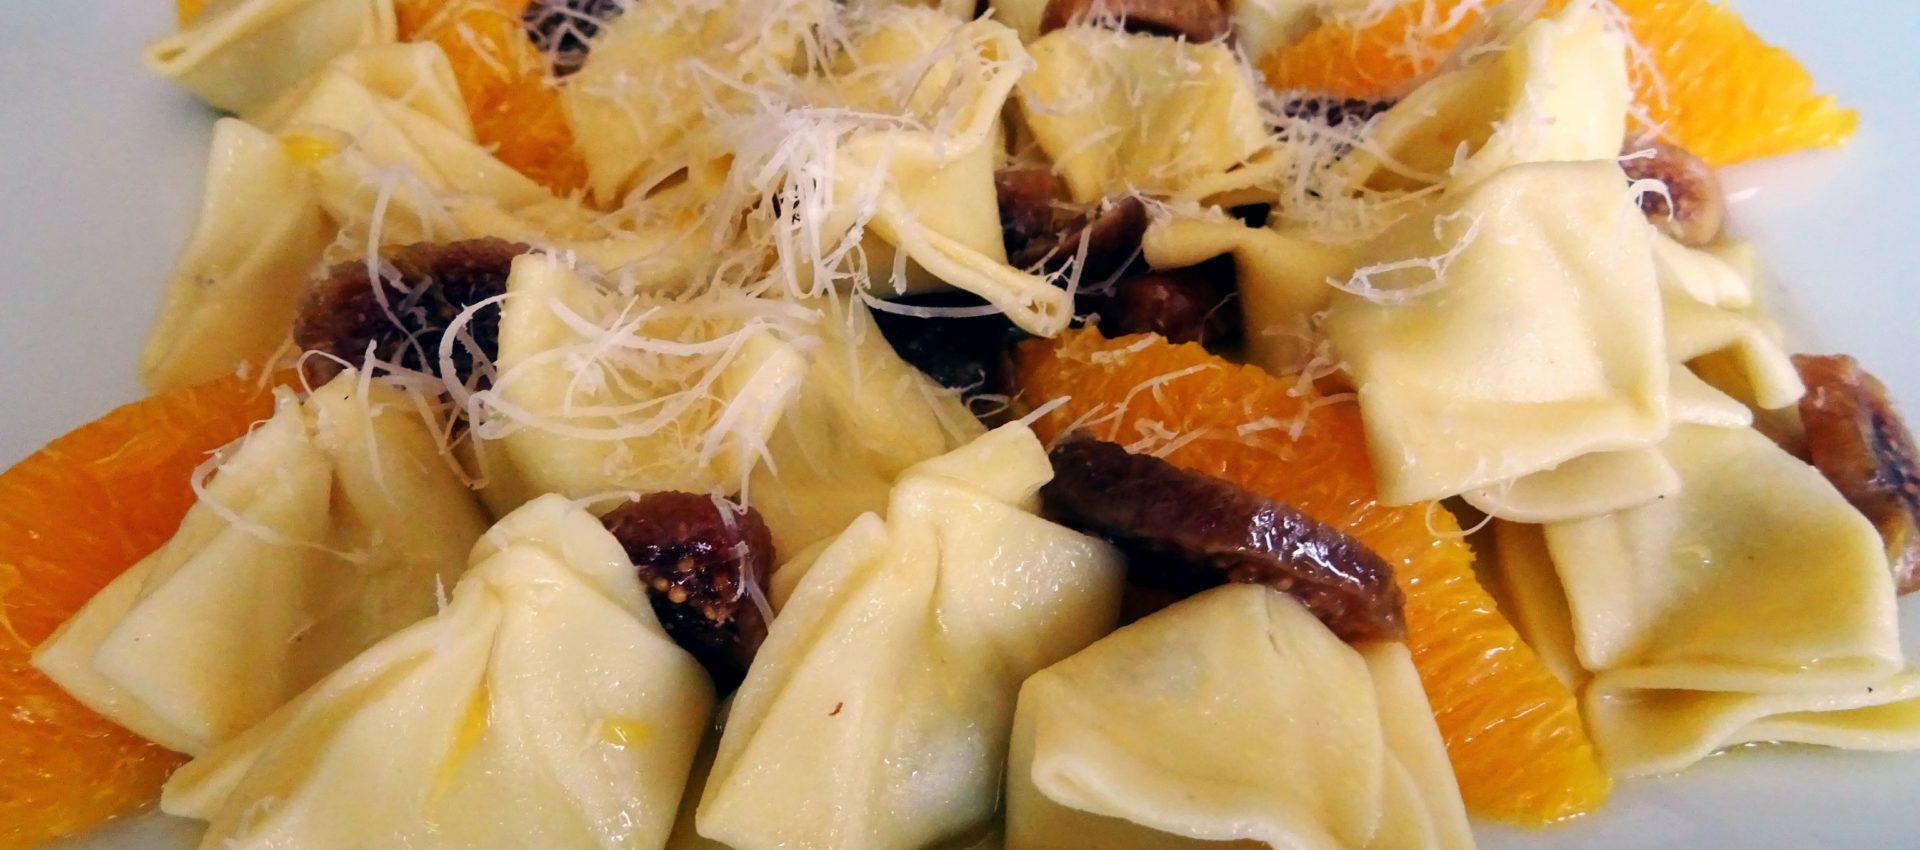 Fagottini gorgonzola salsa naranja e higos